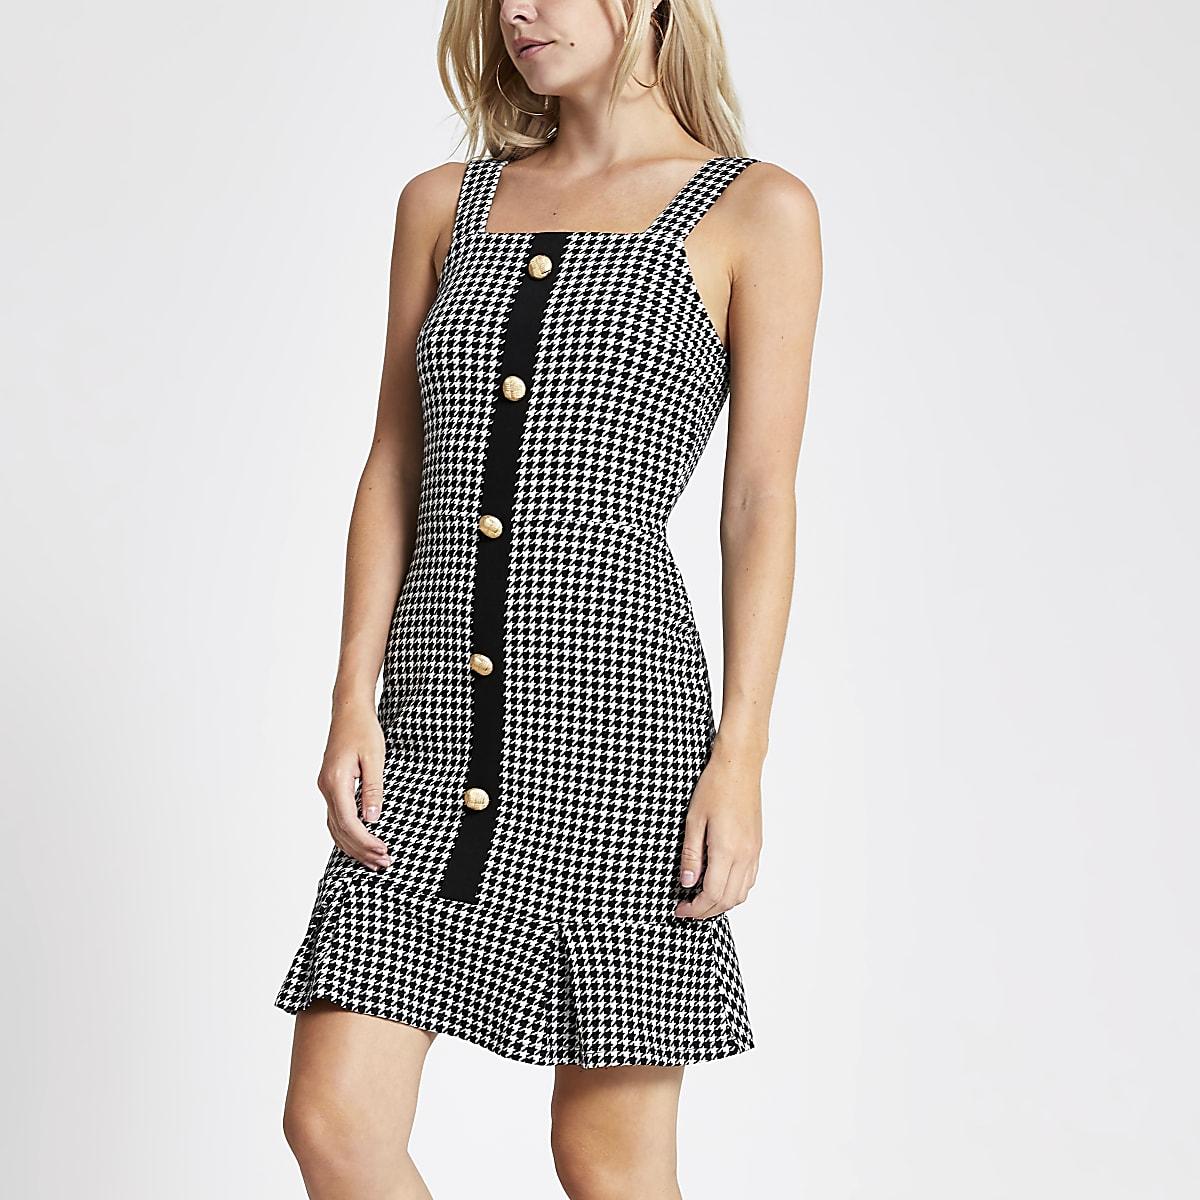 Petite black dogtooth check mini dress